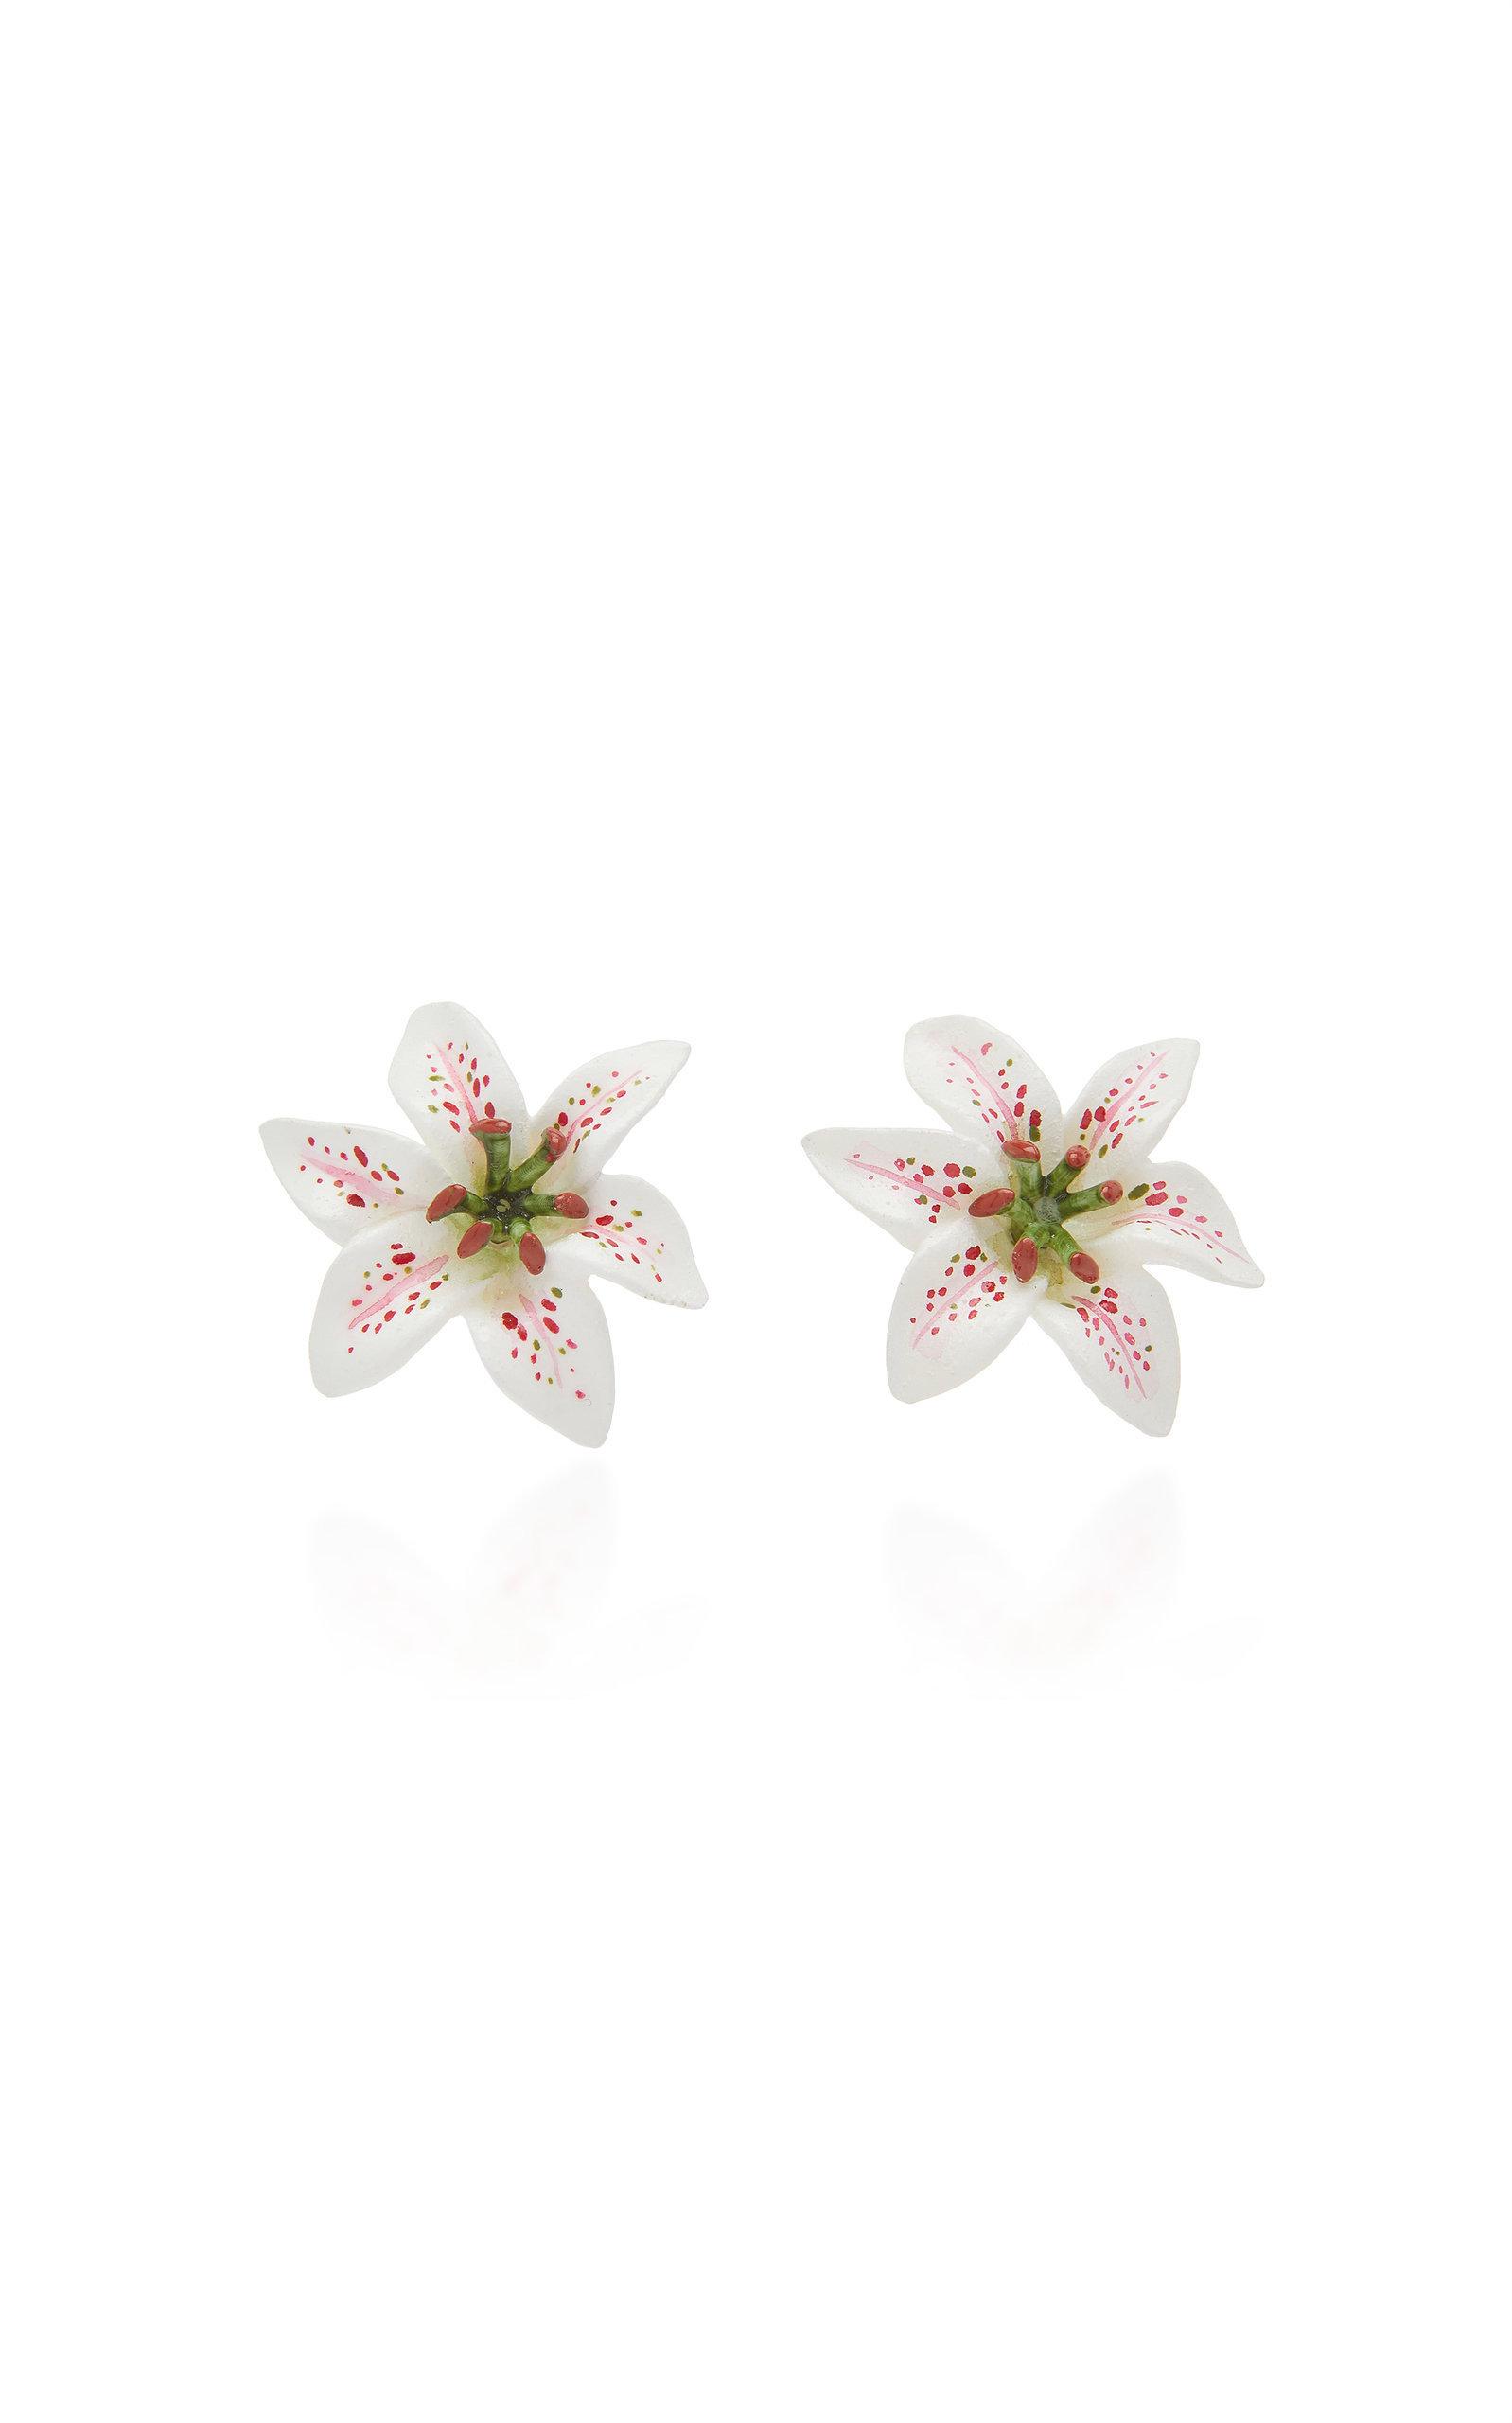 large_dolce-gabbana-white-lily-enamel-earrings.jpg